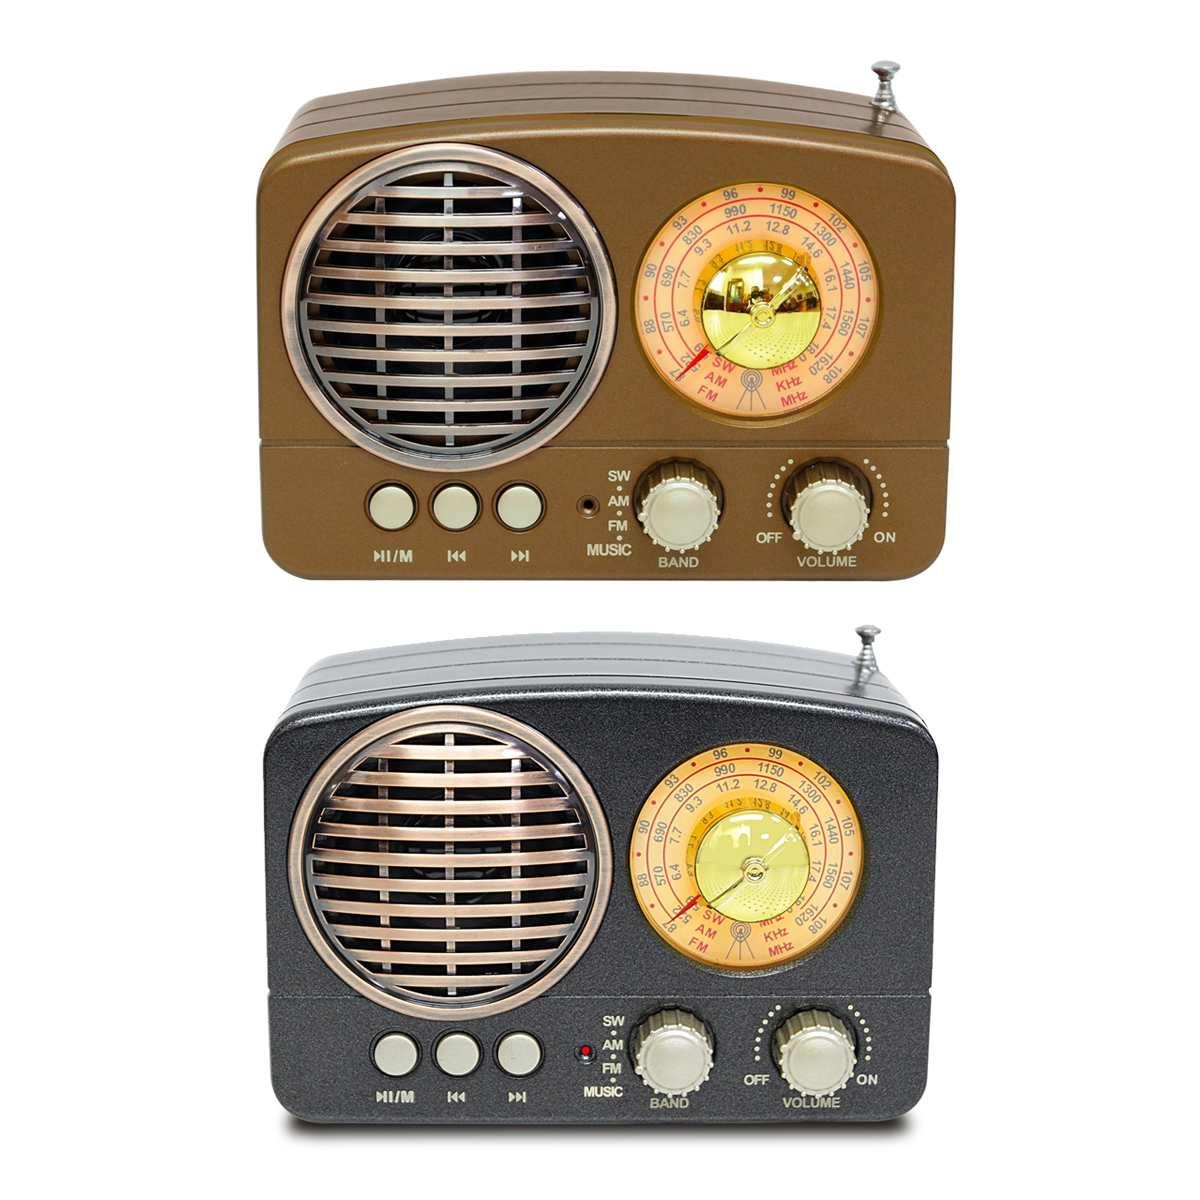 130x90x70mm Tragbare Vintage Retro Radio Am Fm Sw Bluetooth Lautsprecher Tf Karte Slot Usb Lade Home Reise Mini Radio Hindernis Entfernen